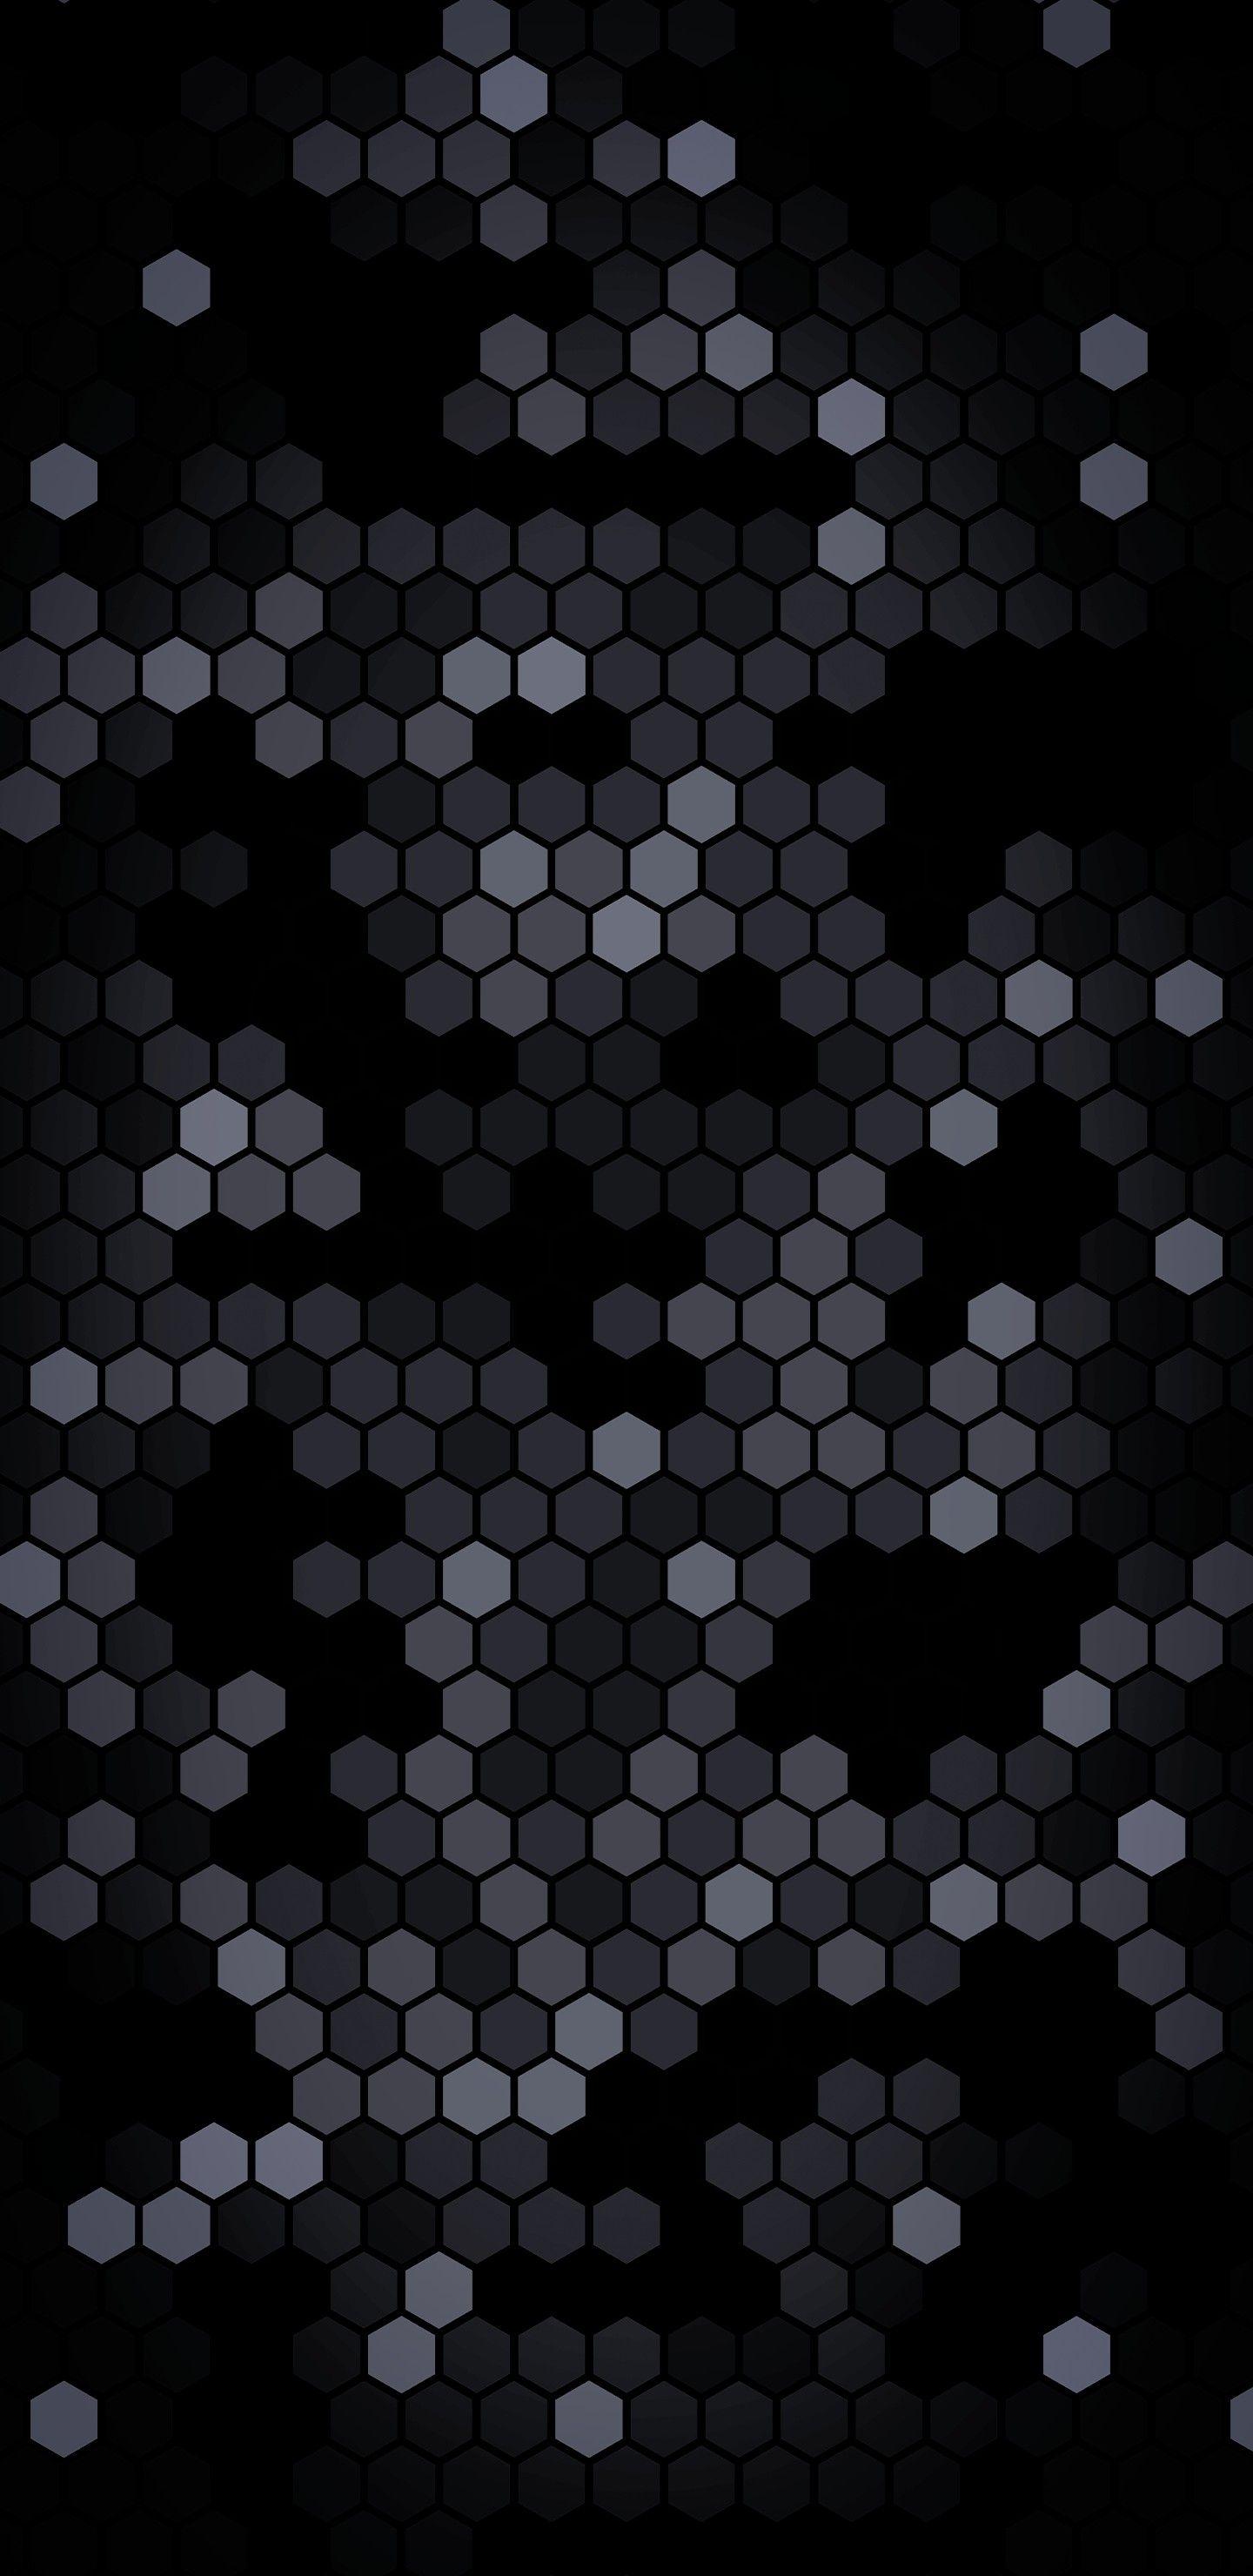 Pattern Black Design Monochrome Black And White Circle